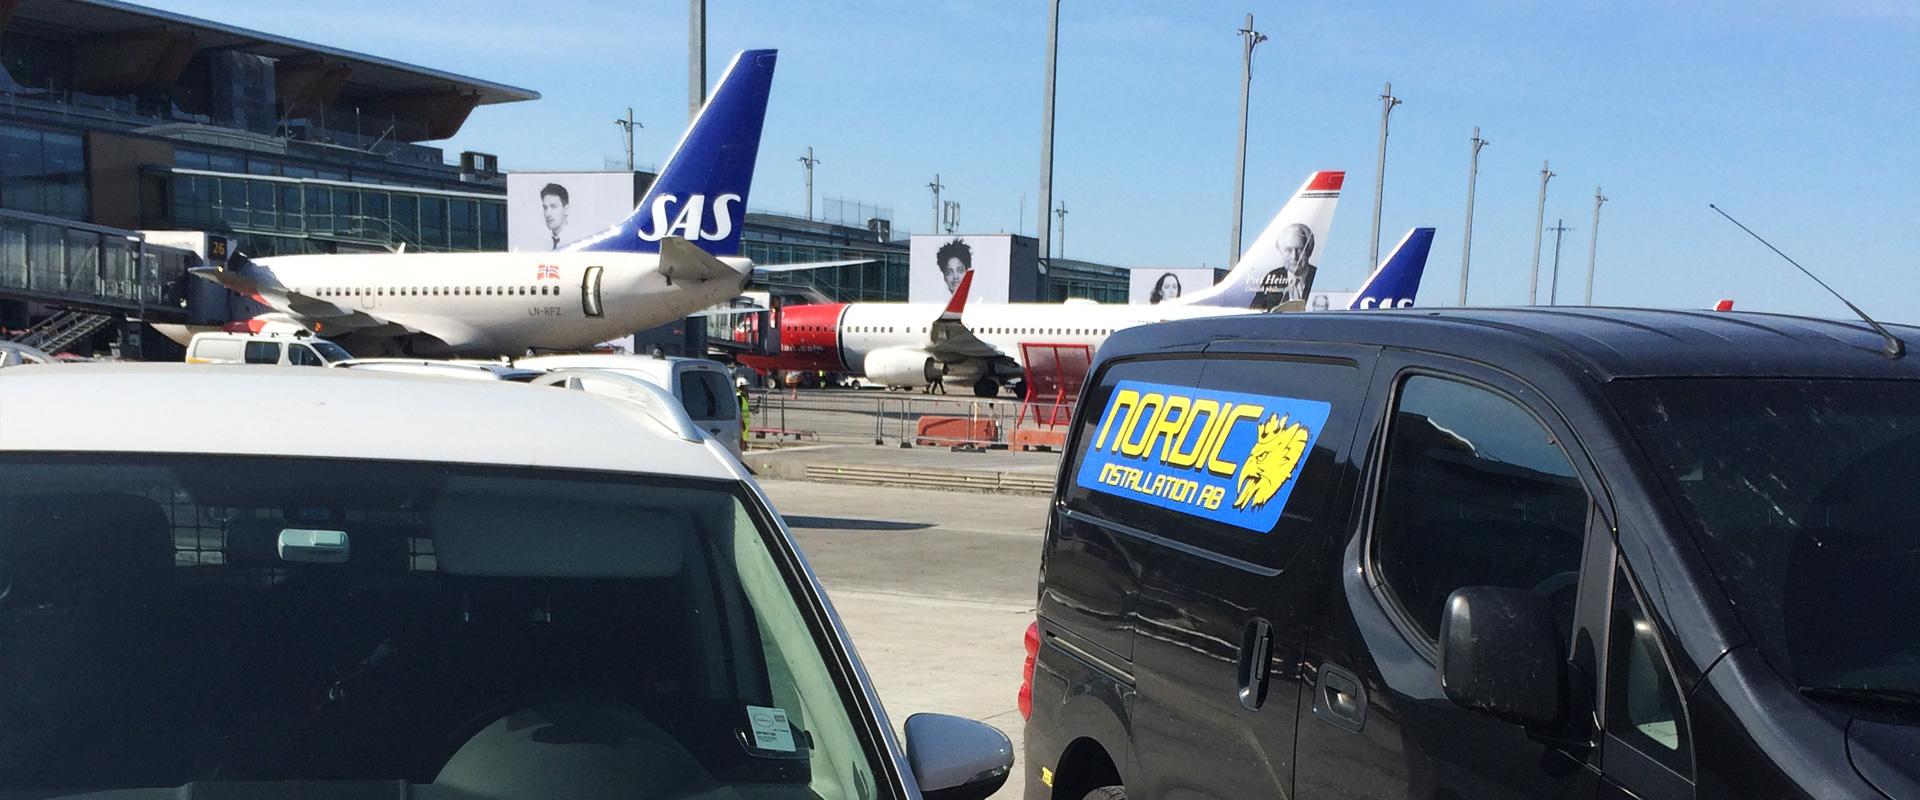 gardermoen-airport-thumb